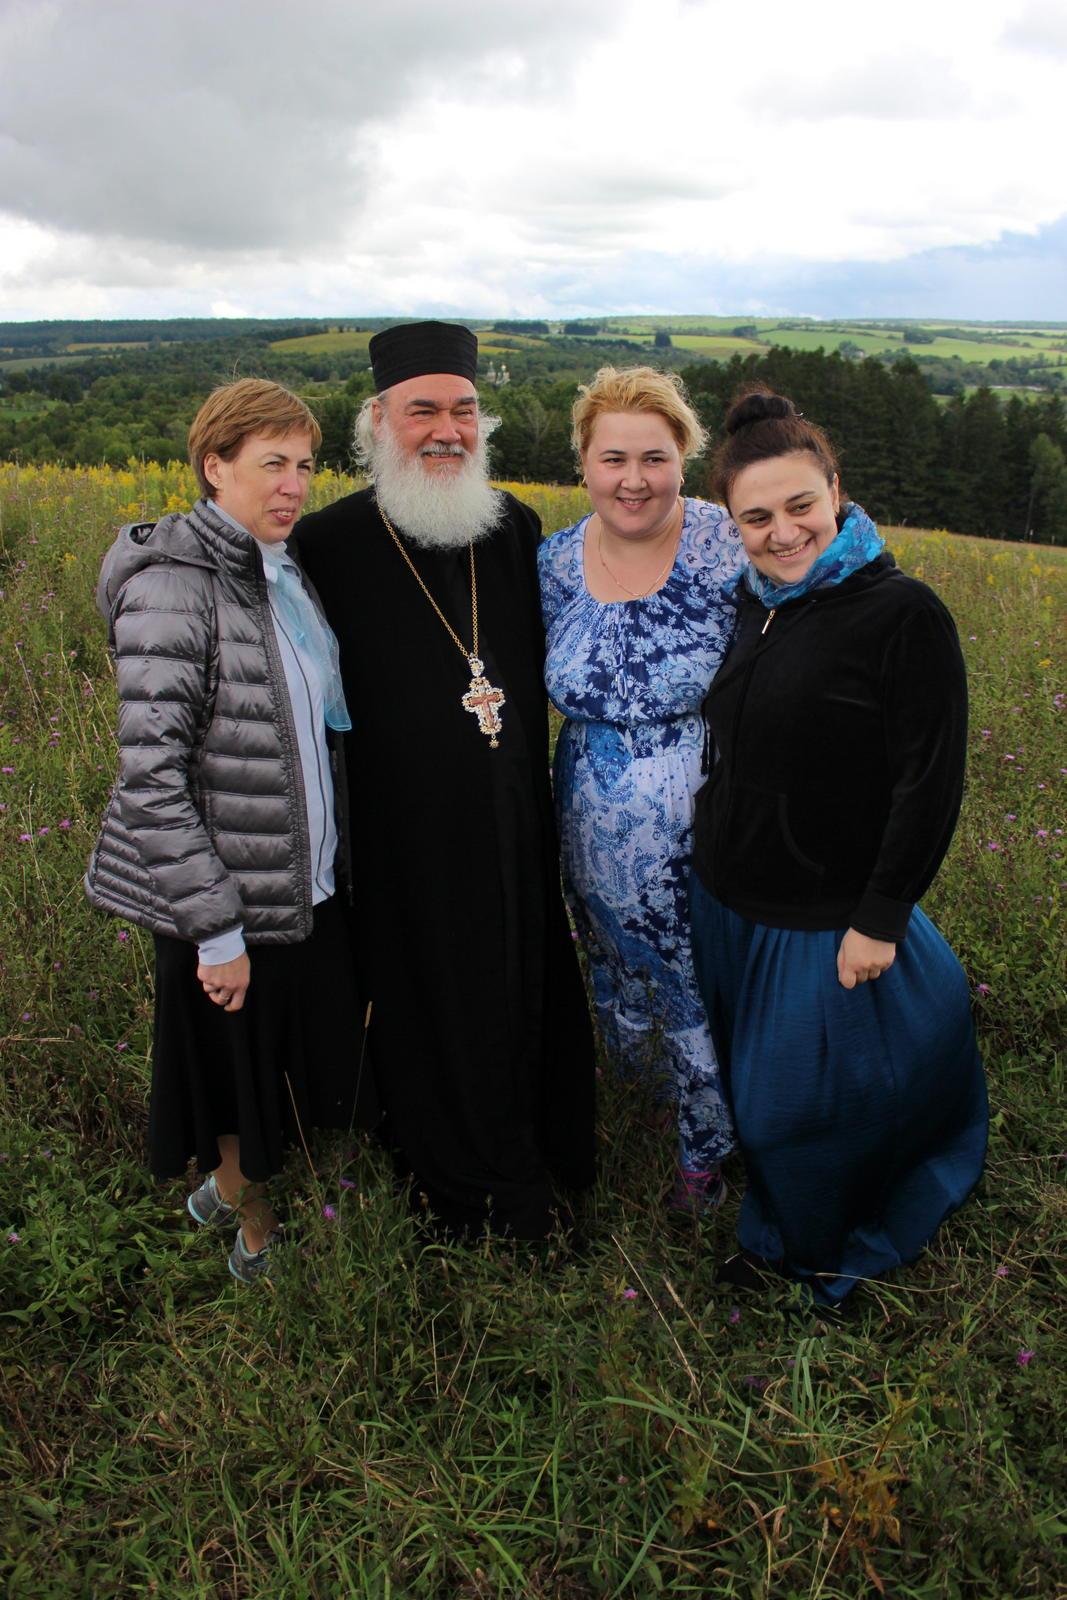 St-Trinity-monastery_02-Sept-2019_3-d-day_111